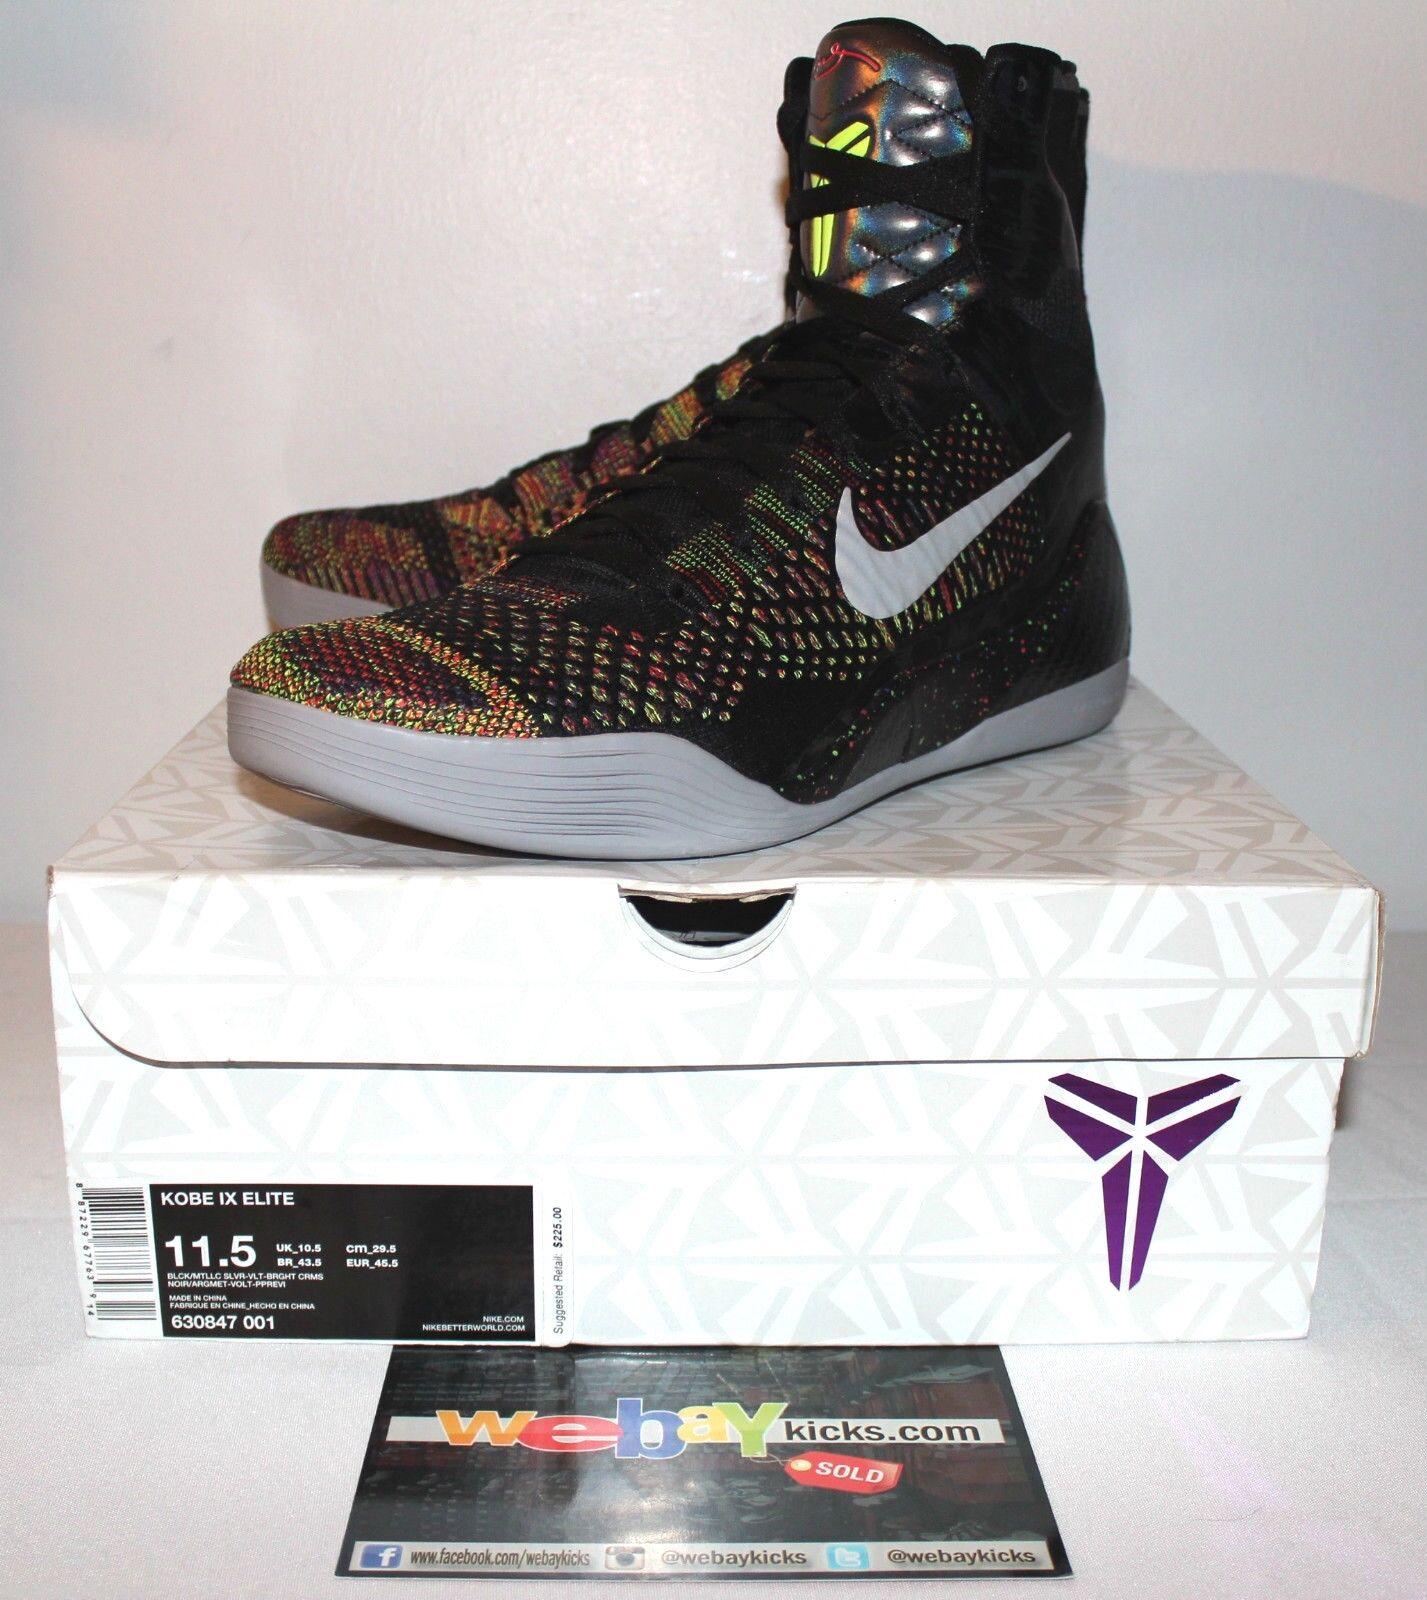 separation shoes eb86e 1670c Nike Air Kobe 9 IX Elite Master Piece Multi Color Sneakers Men s Size 11.5  New good